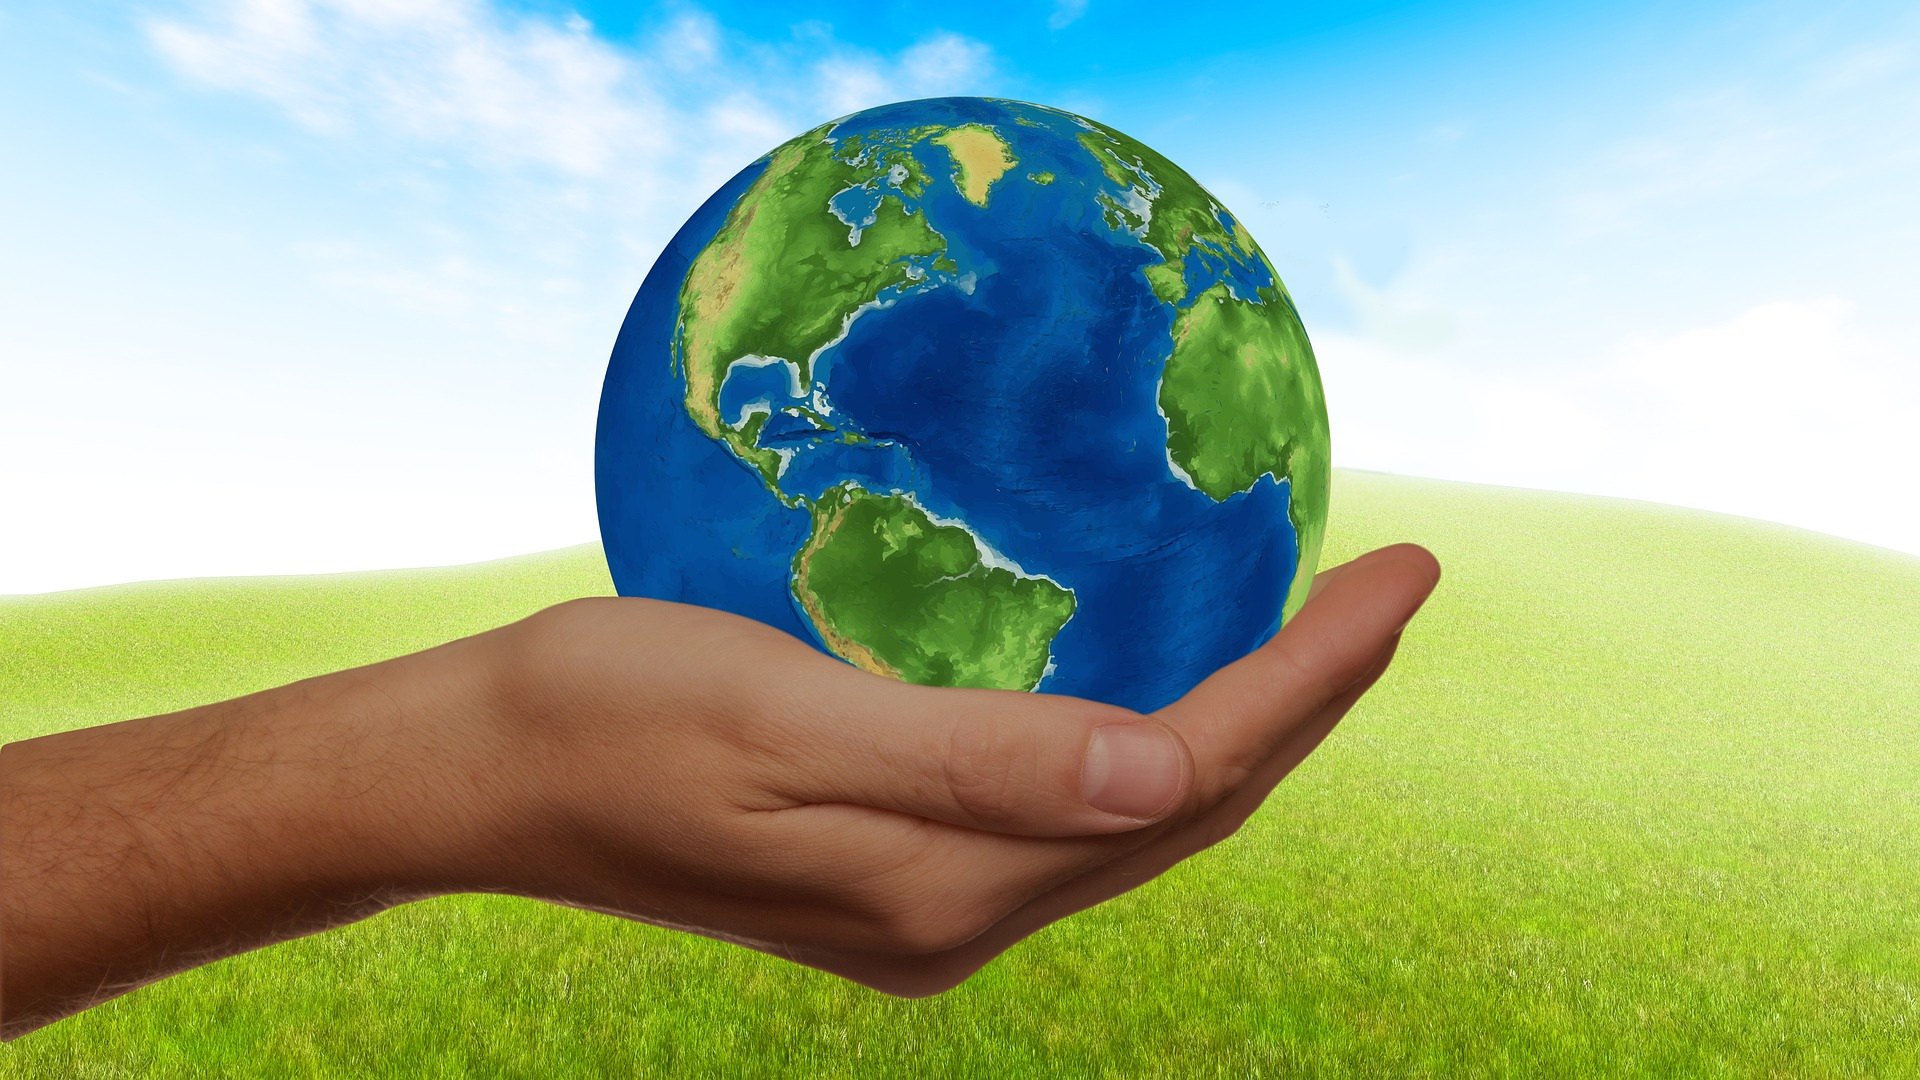 Earth on human hand